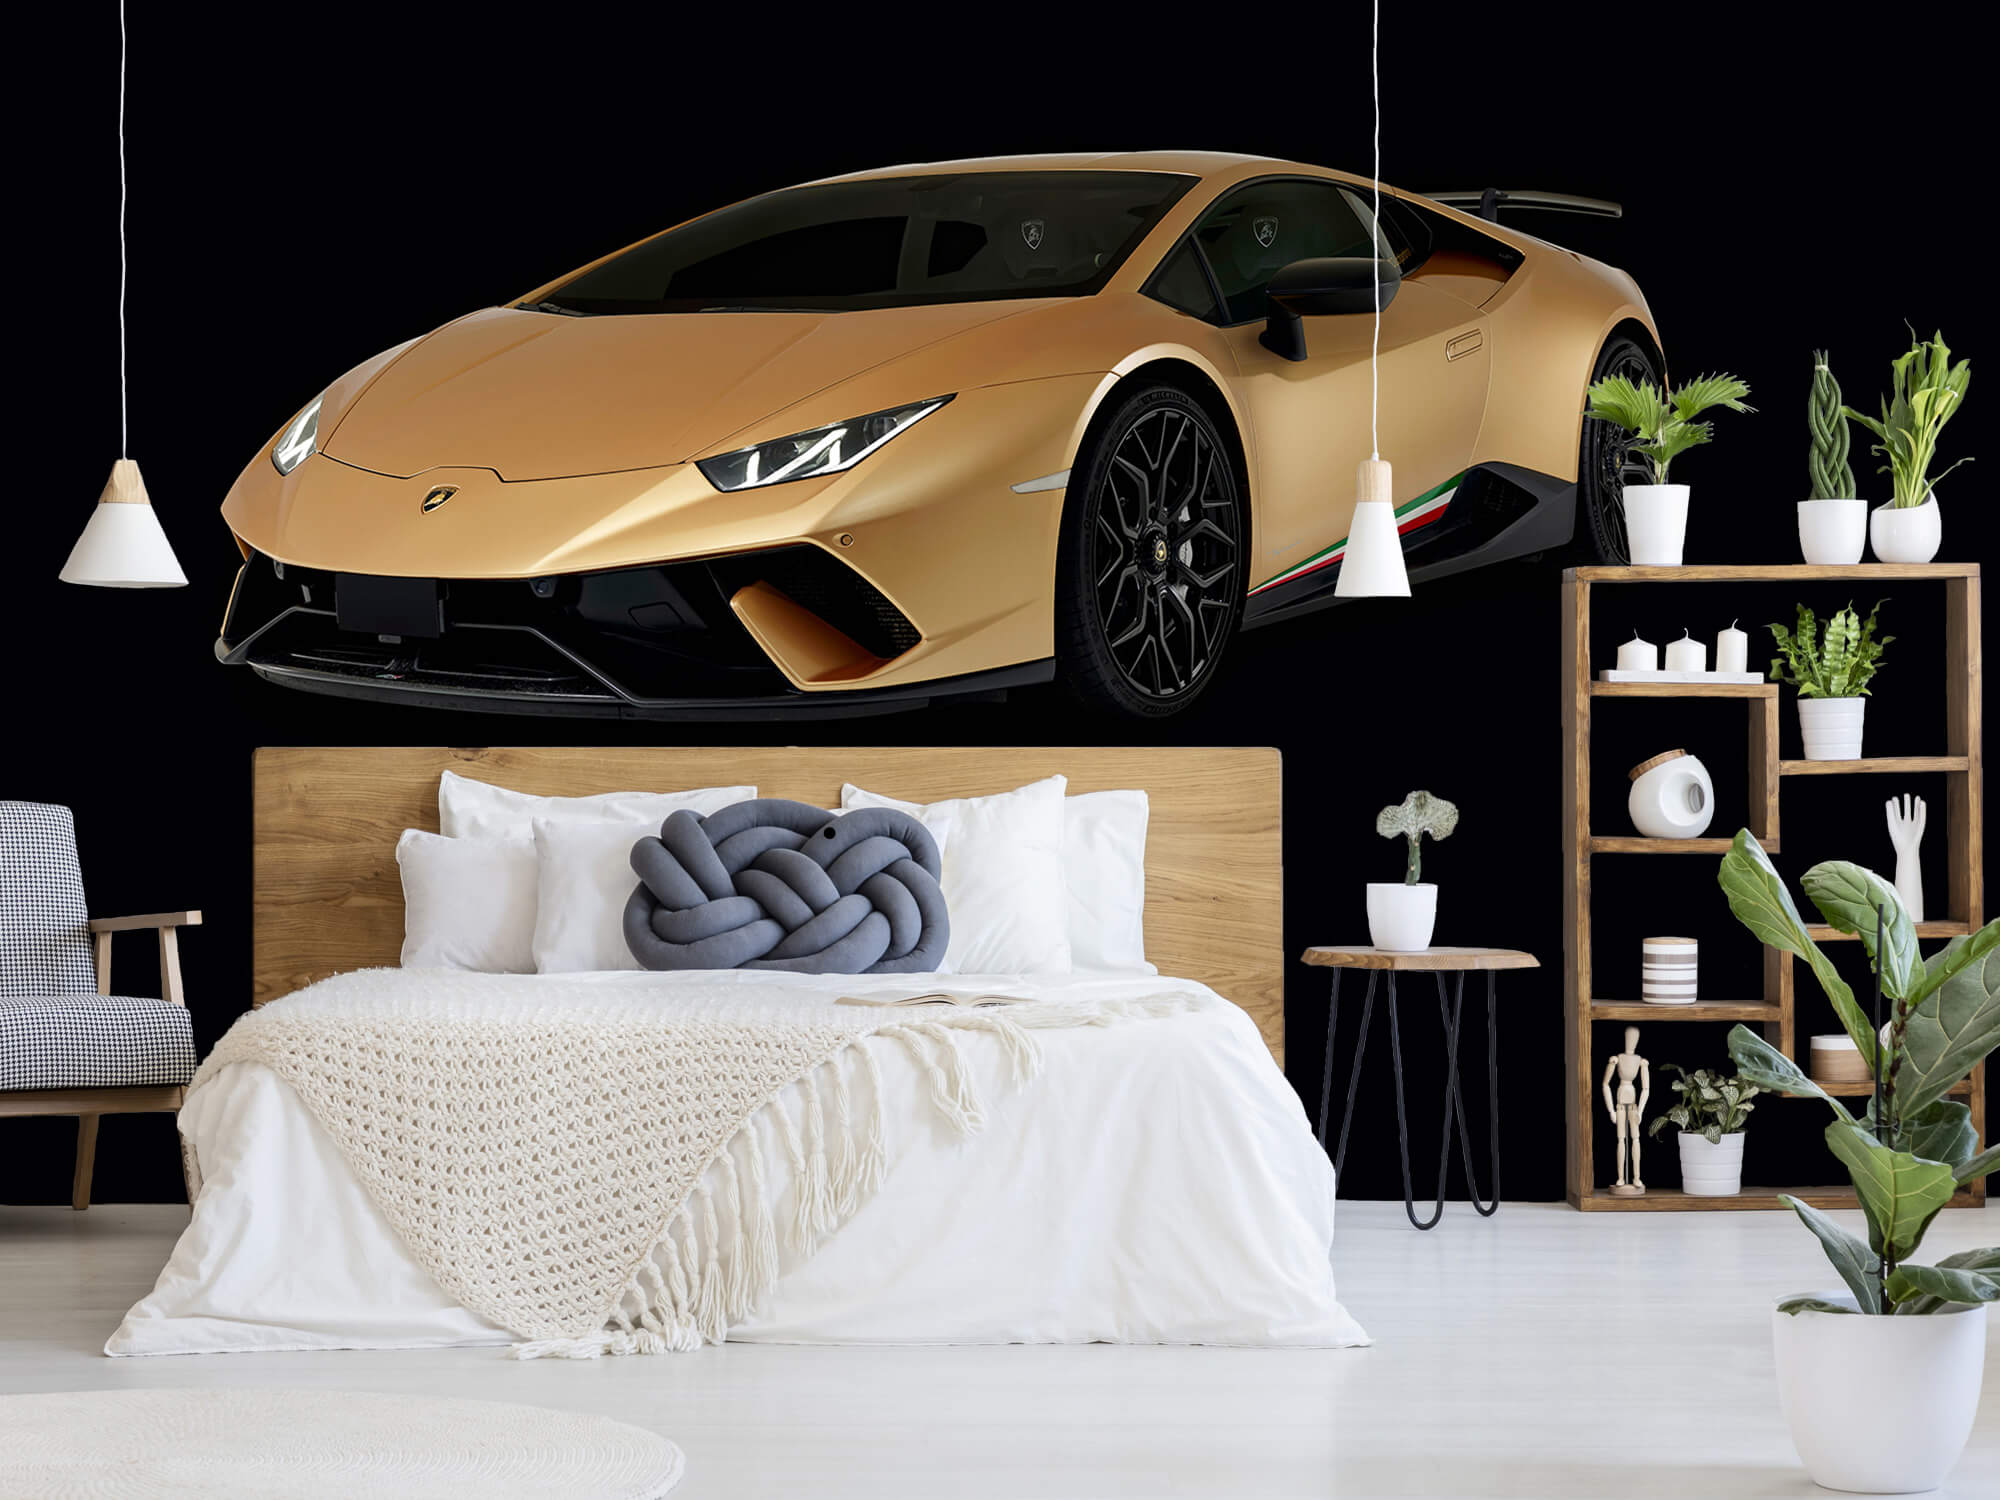 Wallpaper Lamborghini Huracán - Avant droit, noir 7